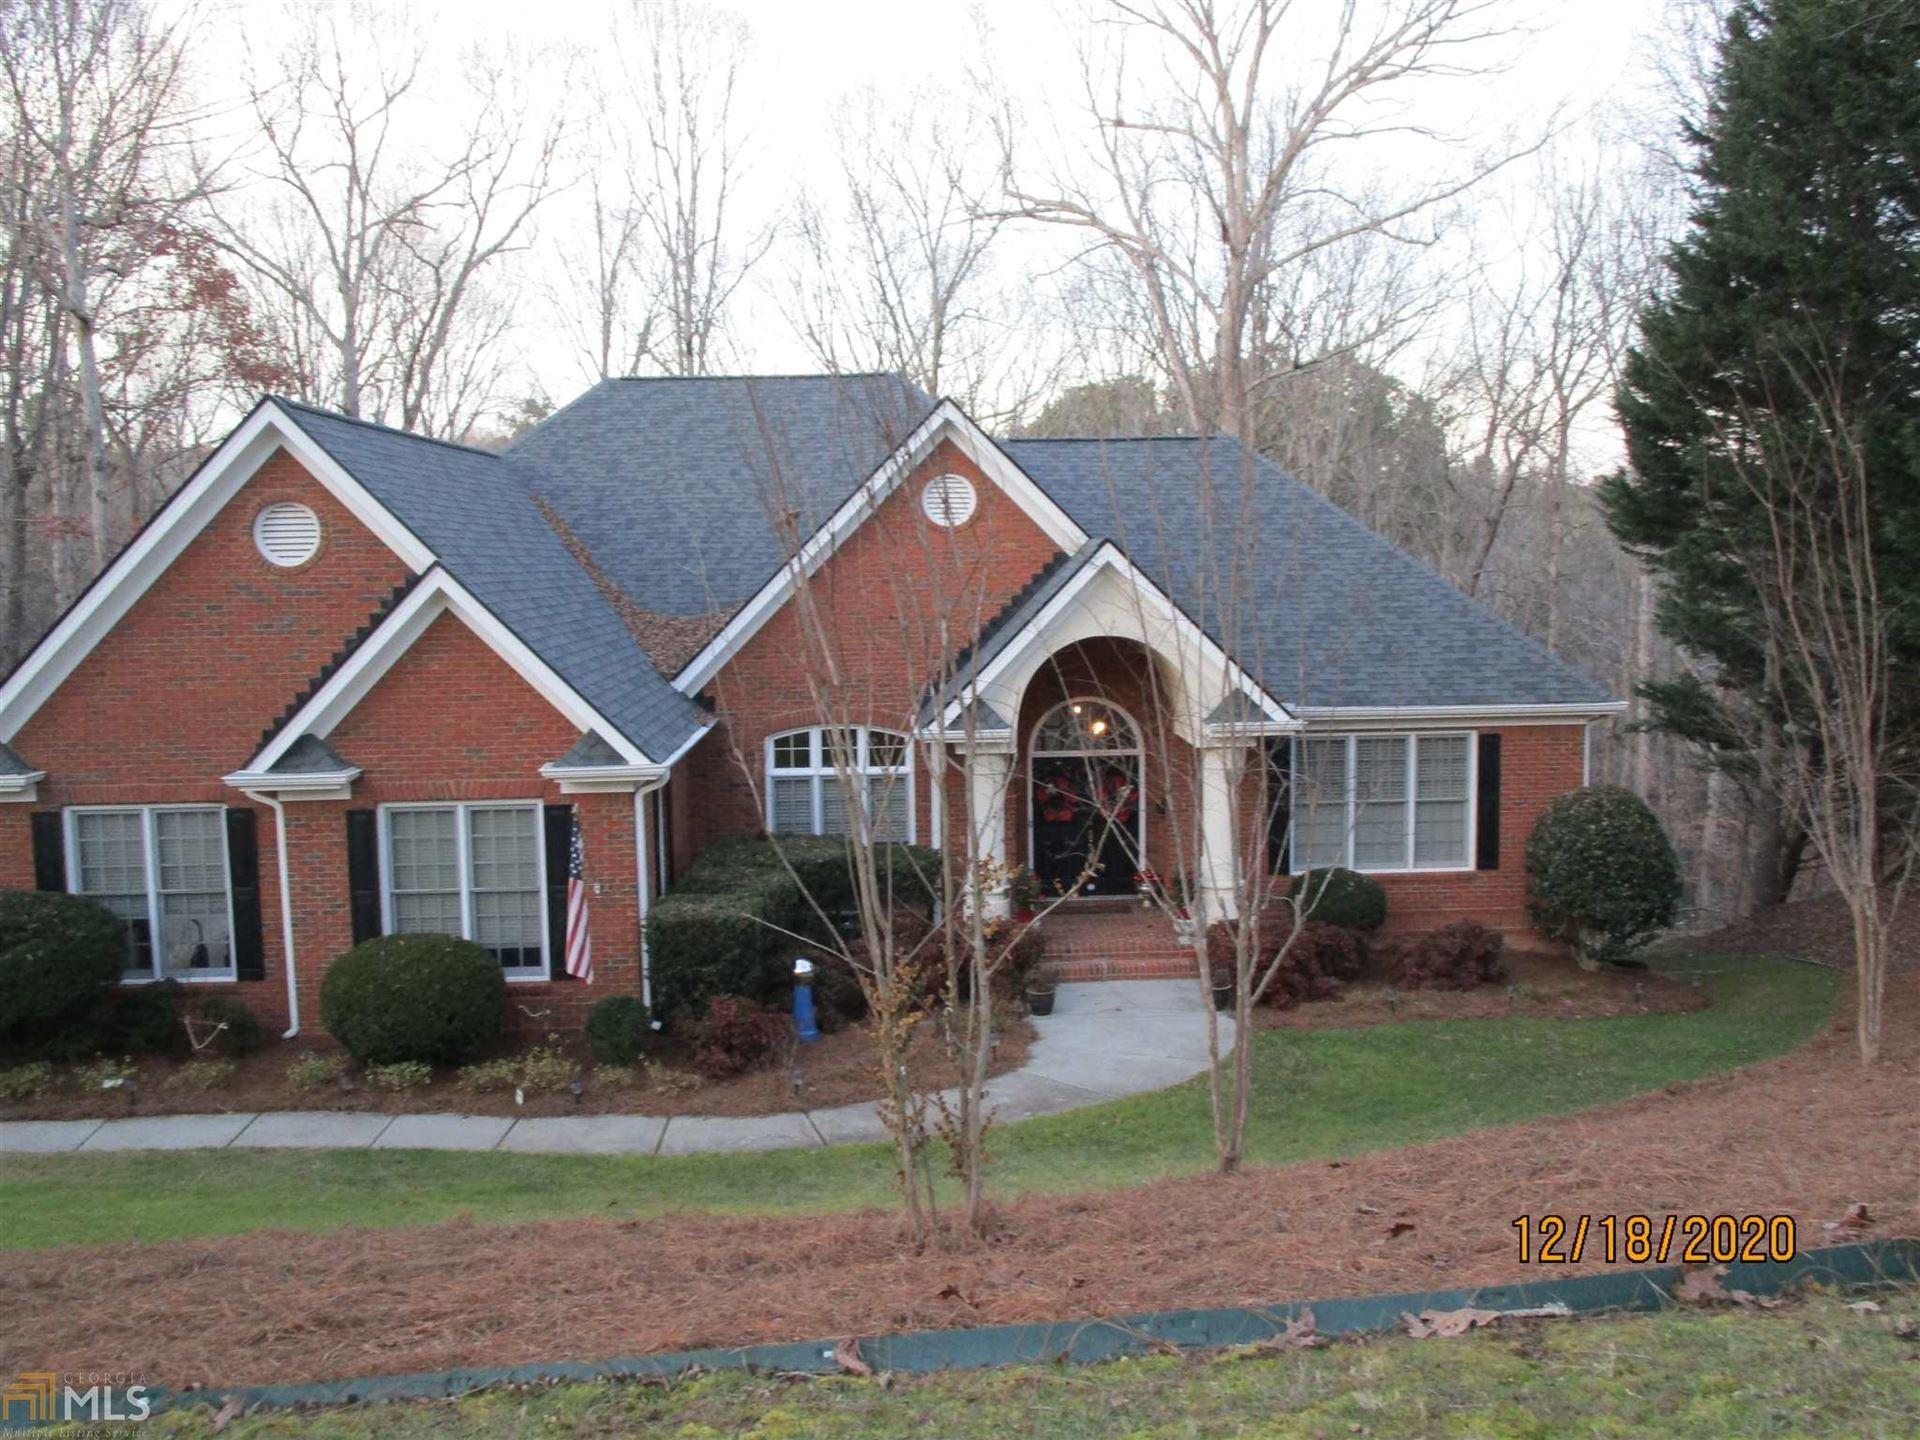 3724 Beaver Creek Rd, Gainesville, GA 30506 - MLS#: 8900723